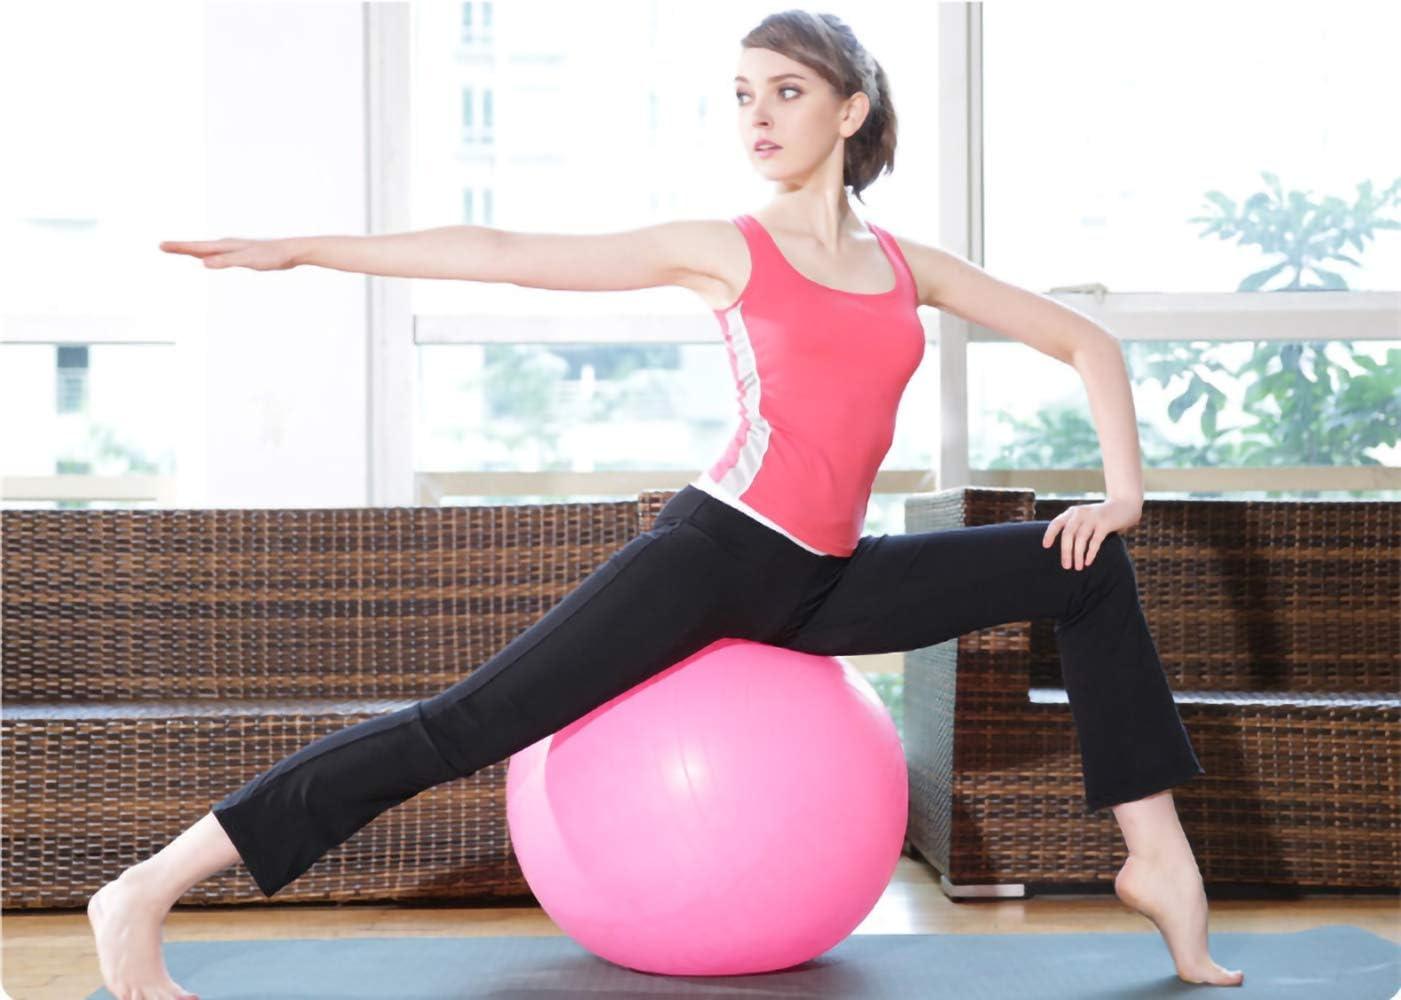 Amazon.com: AINAAN Premium - Pelota de yoga extra gruesa ...